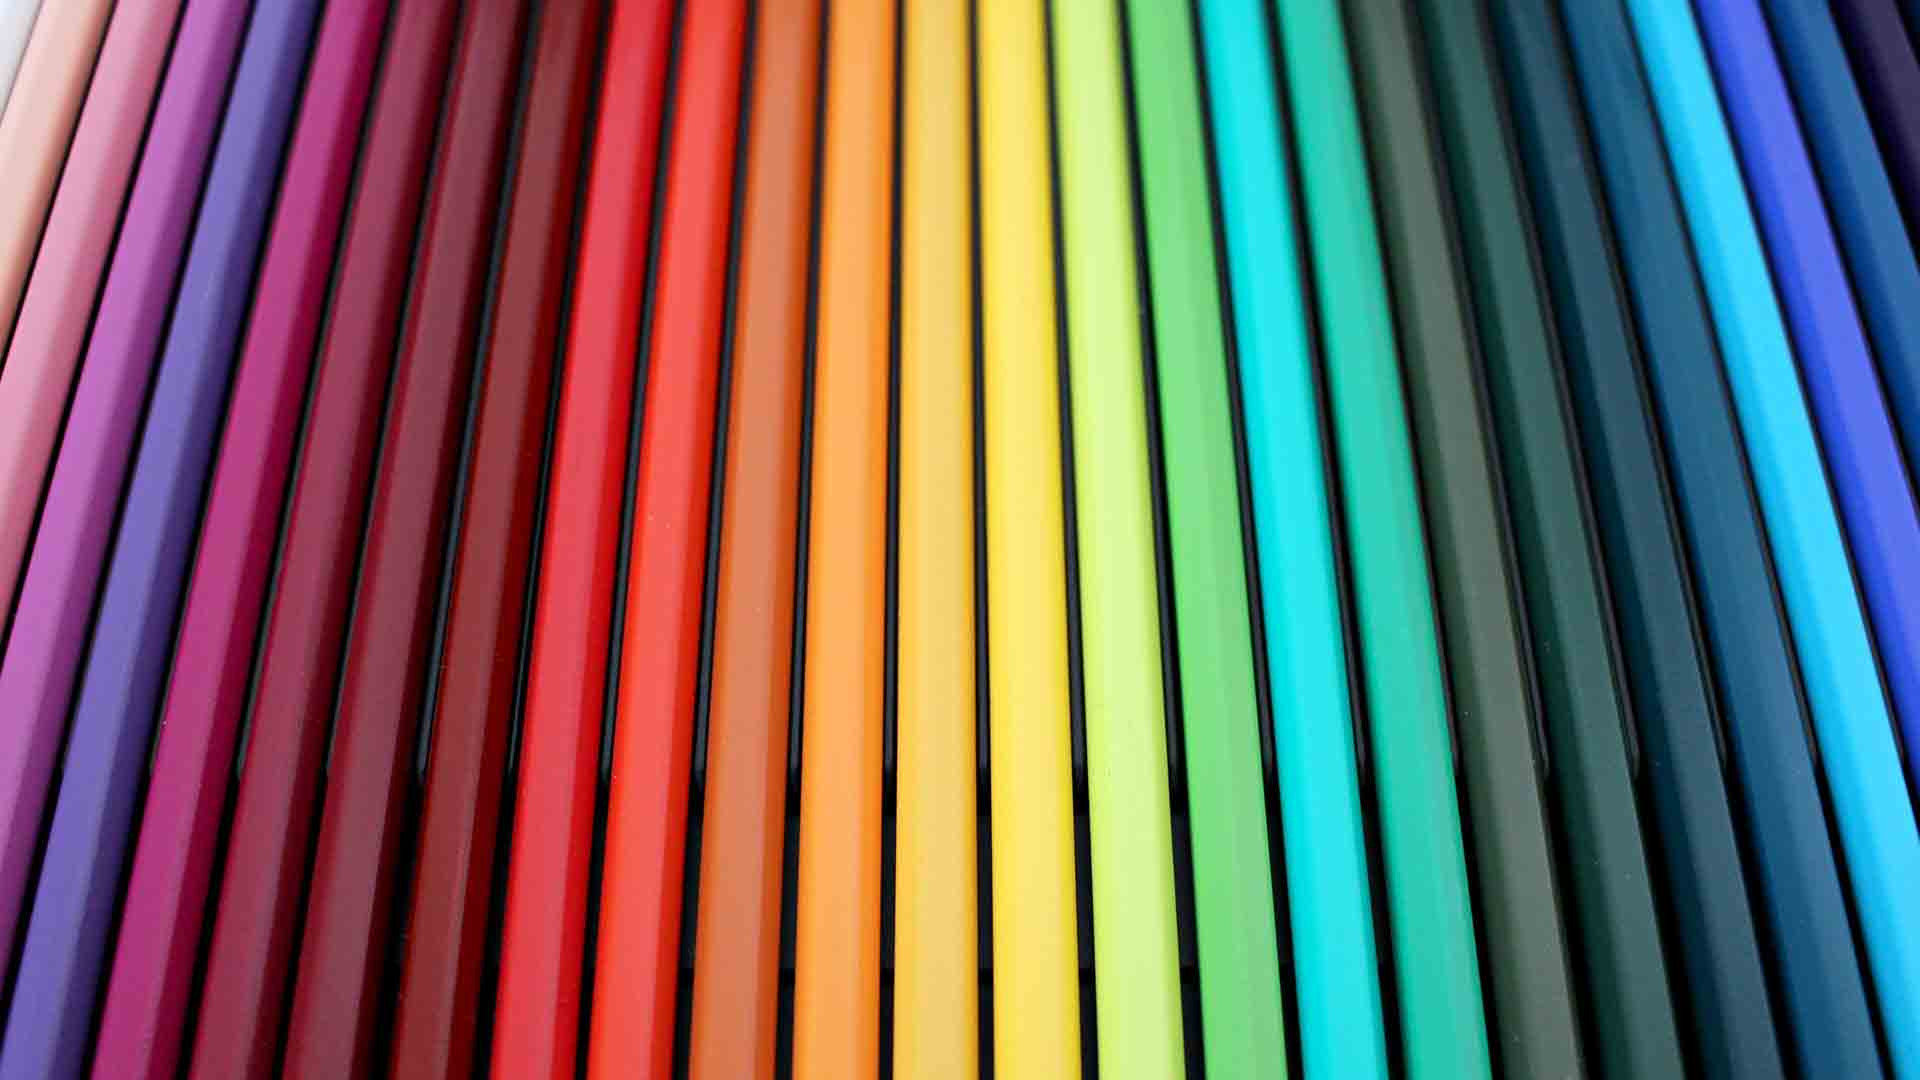 Occhiali da sole Estate 2020: i colori di tendenza!